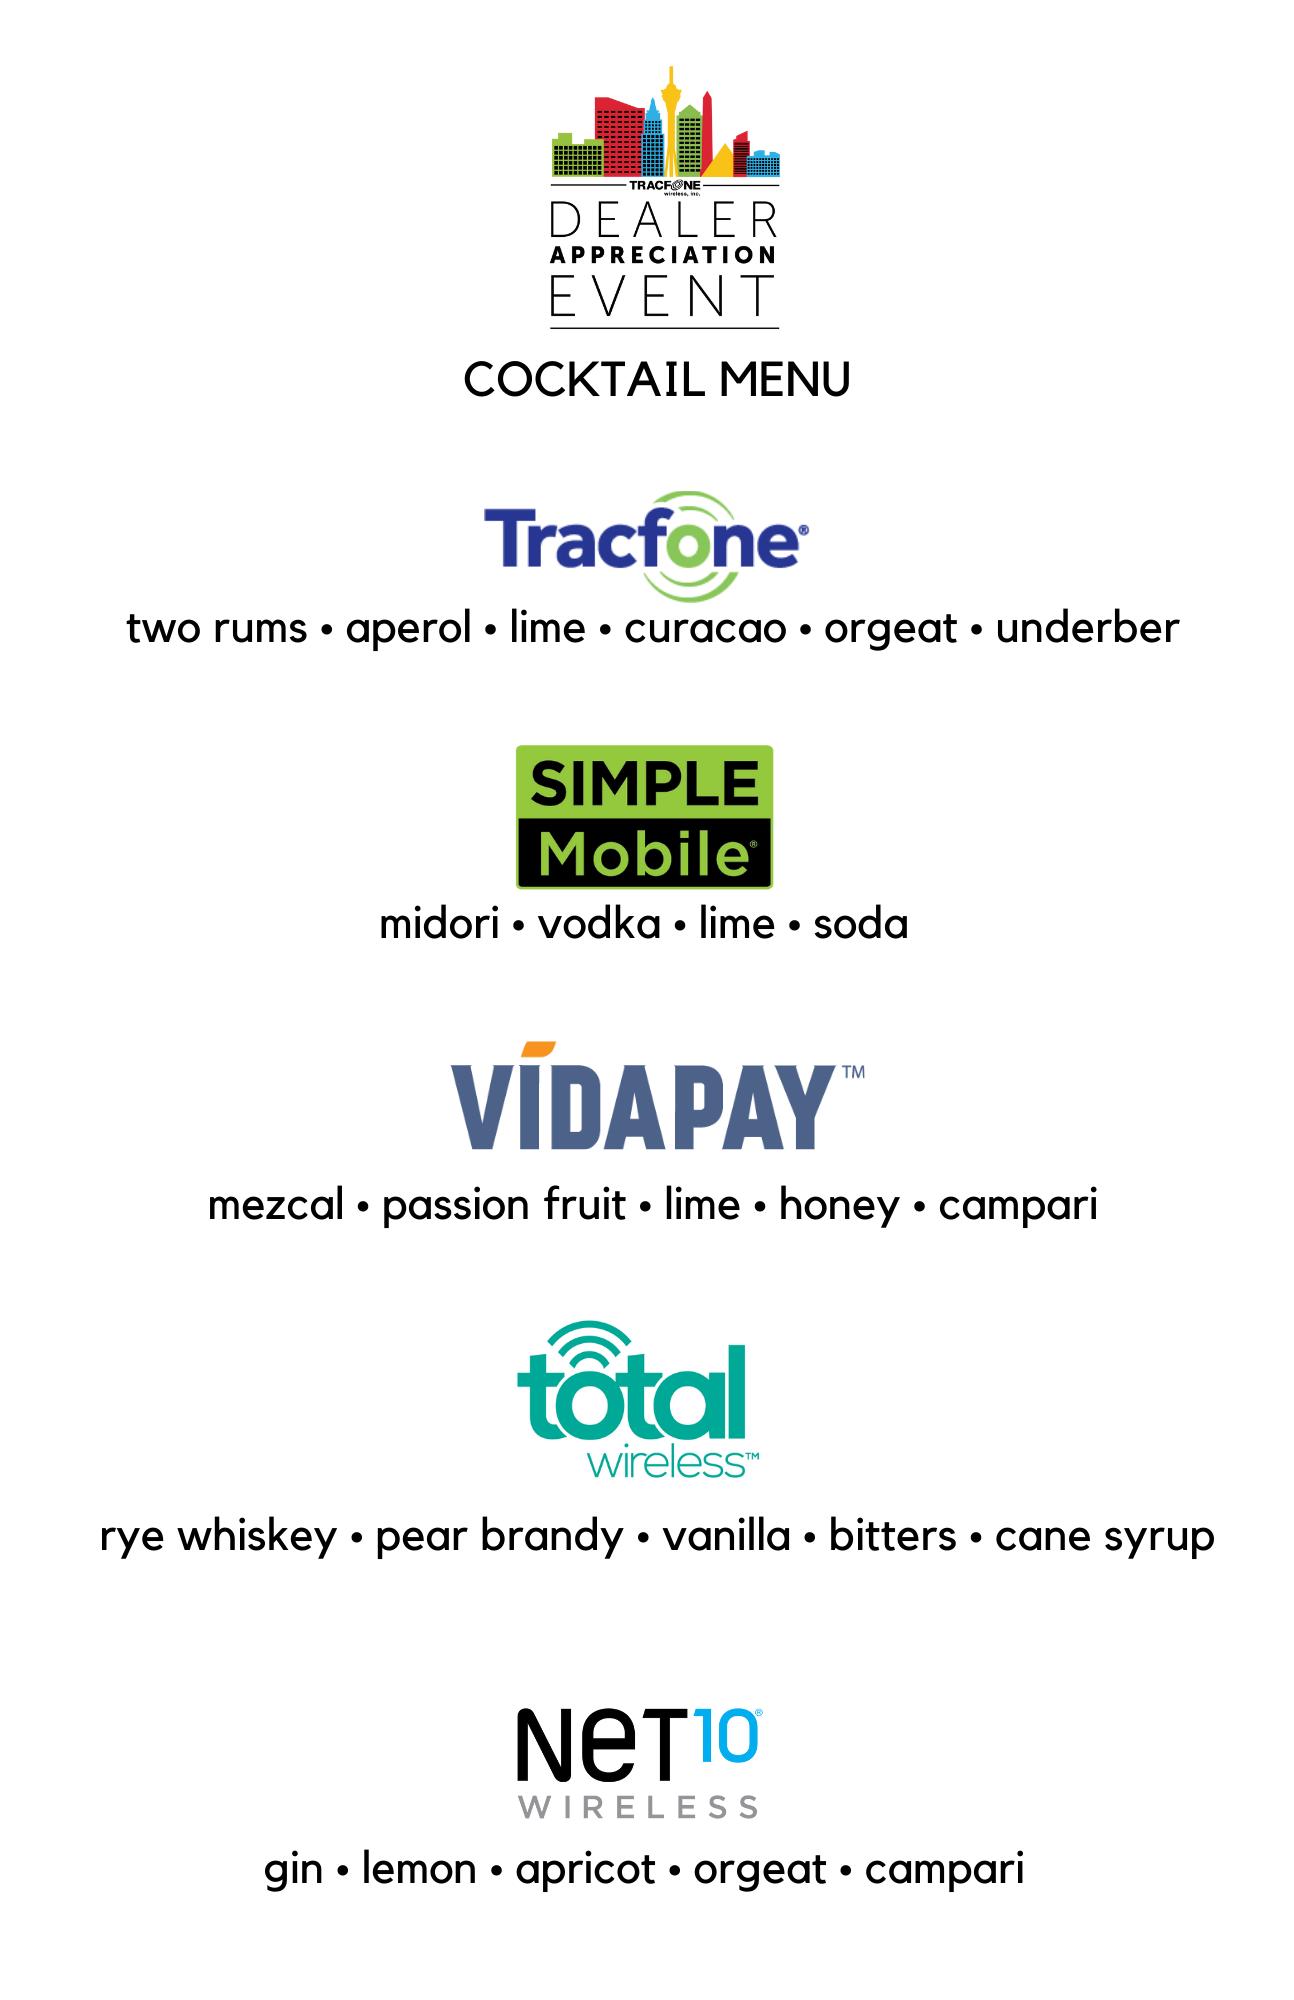 Dealer Appreciation Cocktail Menu